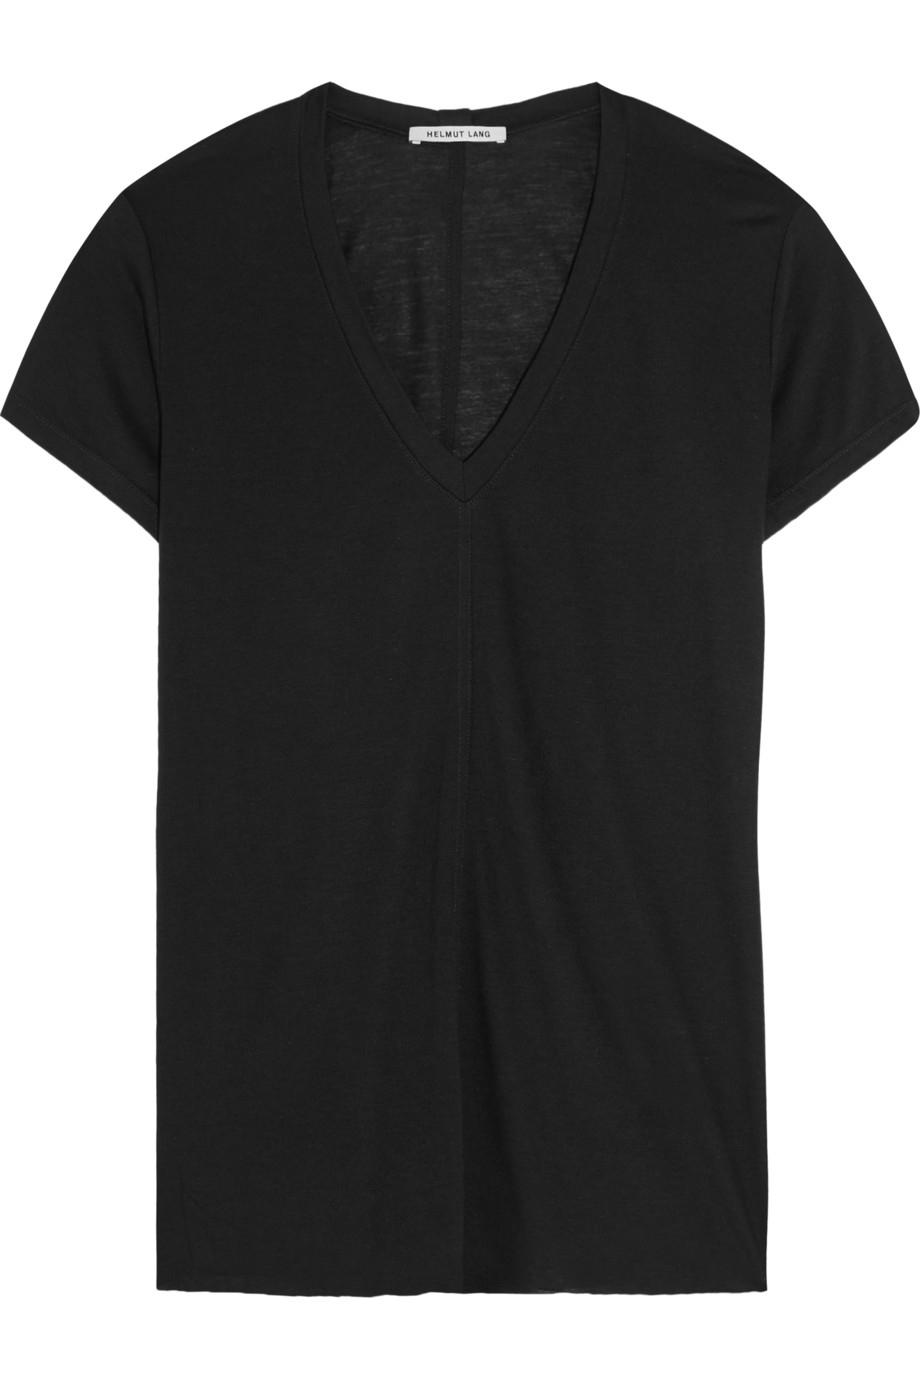 helmut lang micro modal blend jersey t shirt in black lyst. Black Bedroom Furniture Sets. Home Design Ideas